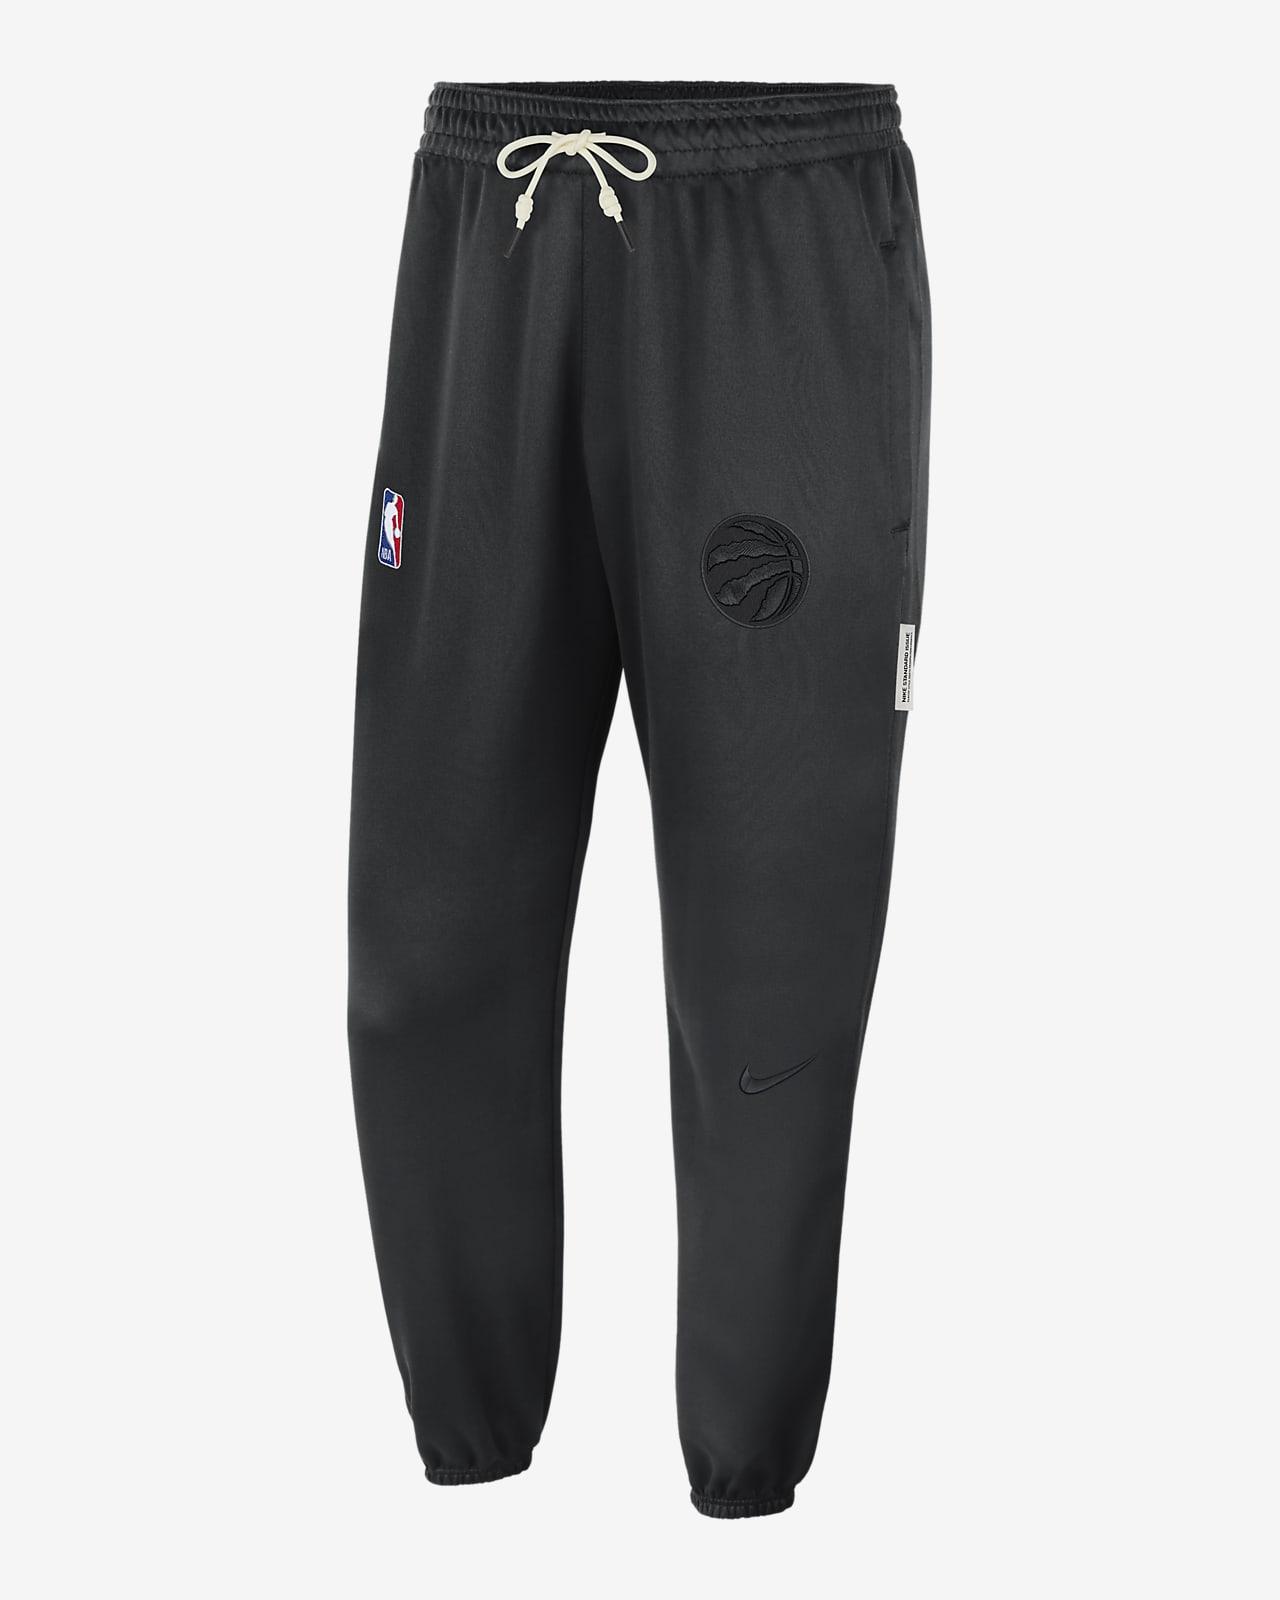 Toronto Raptors Standard Issue Men's Nike Dri-FIT NBA Trousers